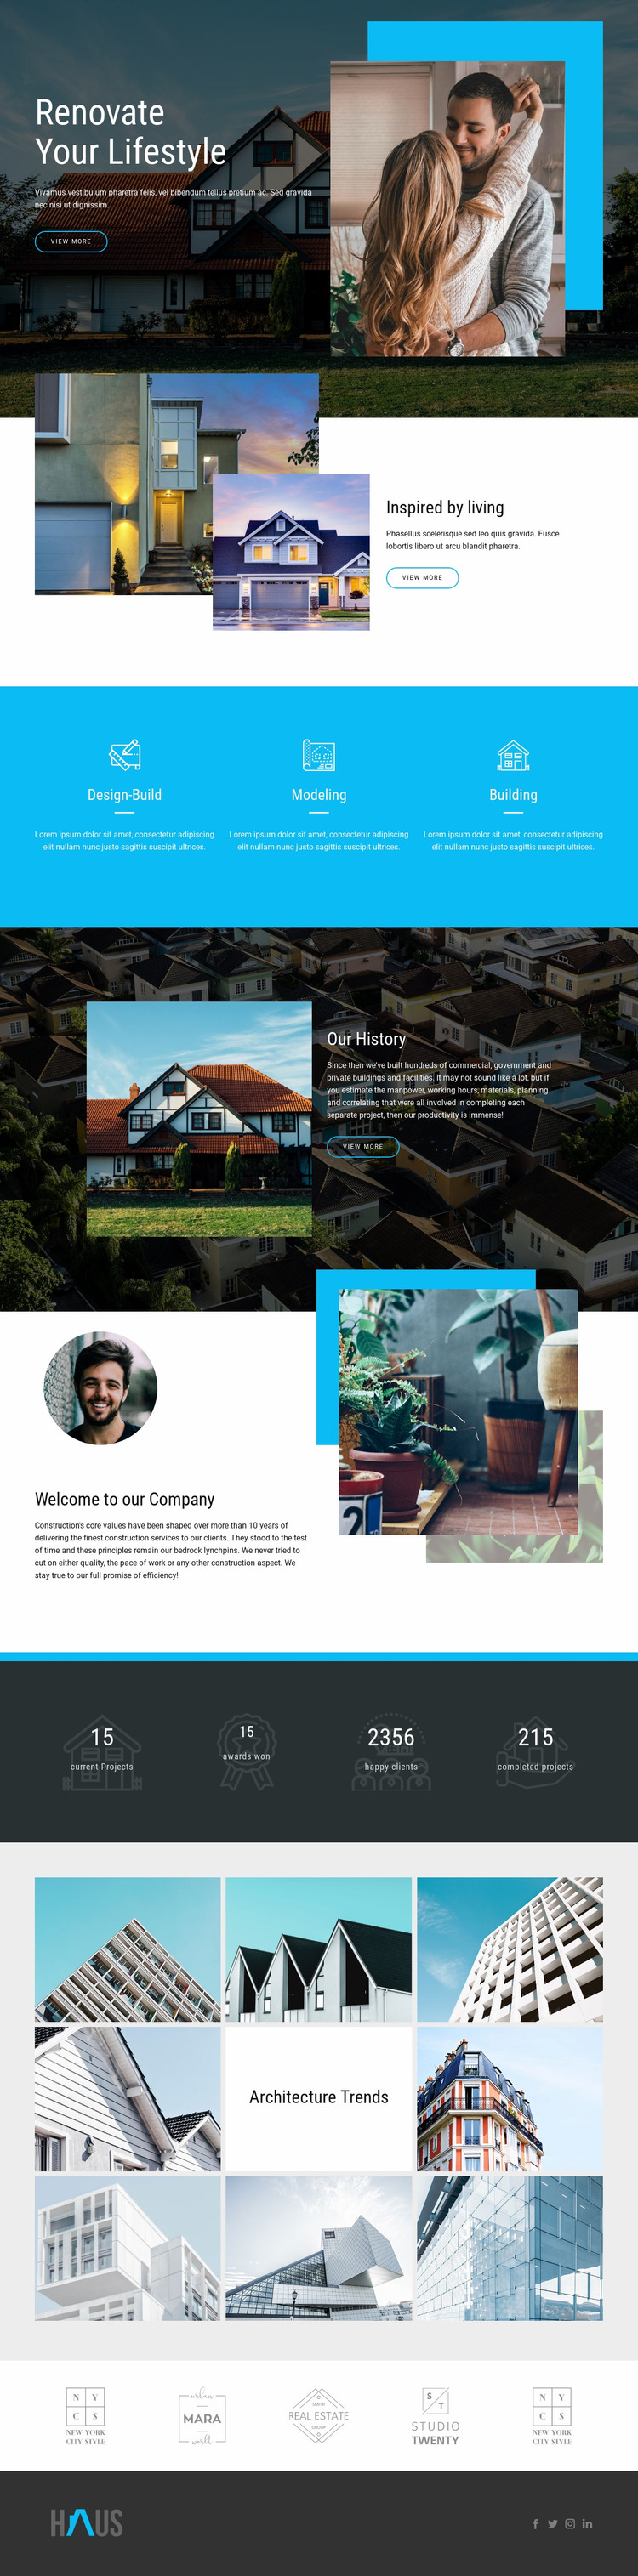 Renovate real estate Website Mockup